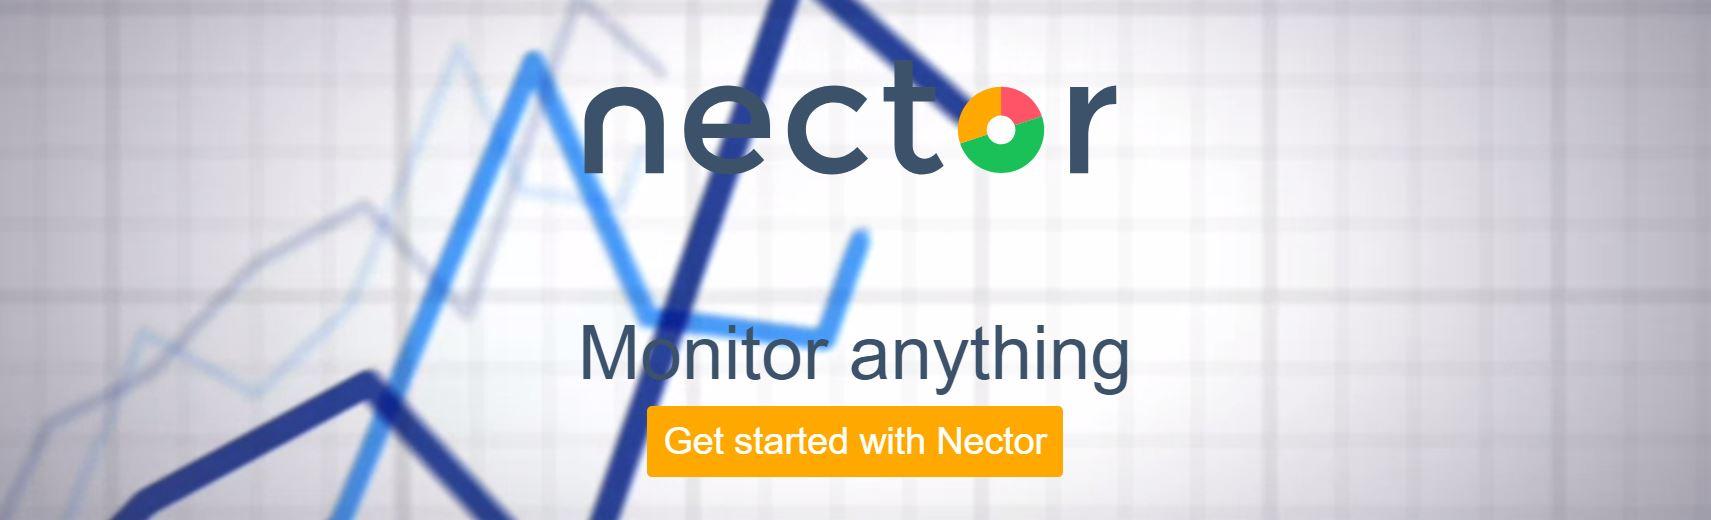 nector - iot monitoring